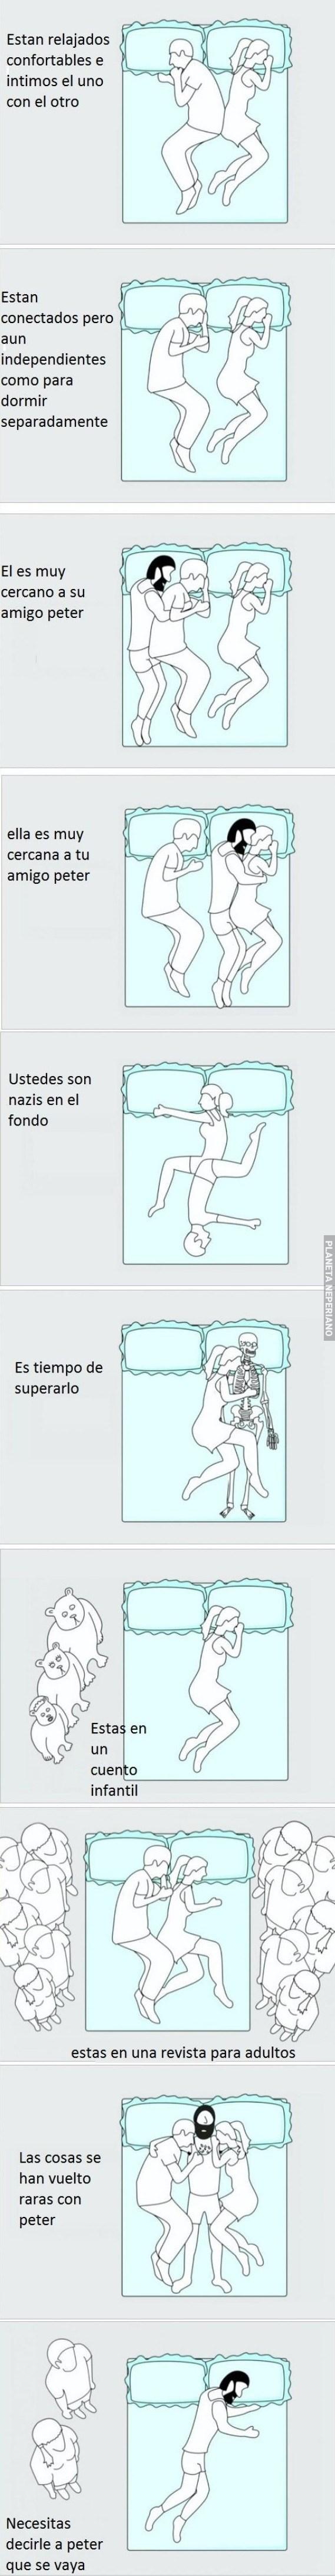 vineta larga sobre como es dormir en pareja